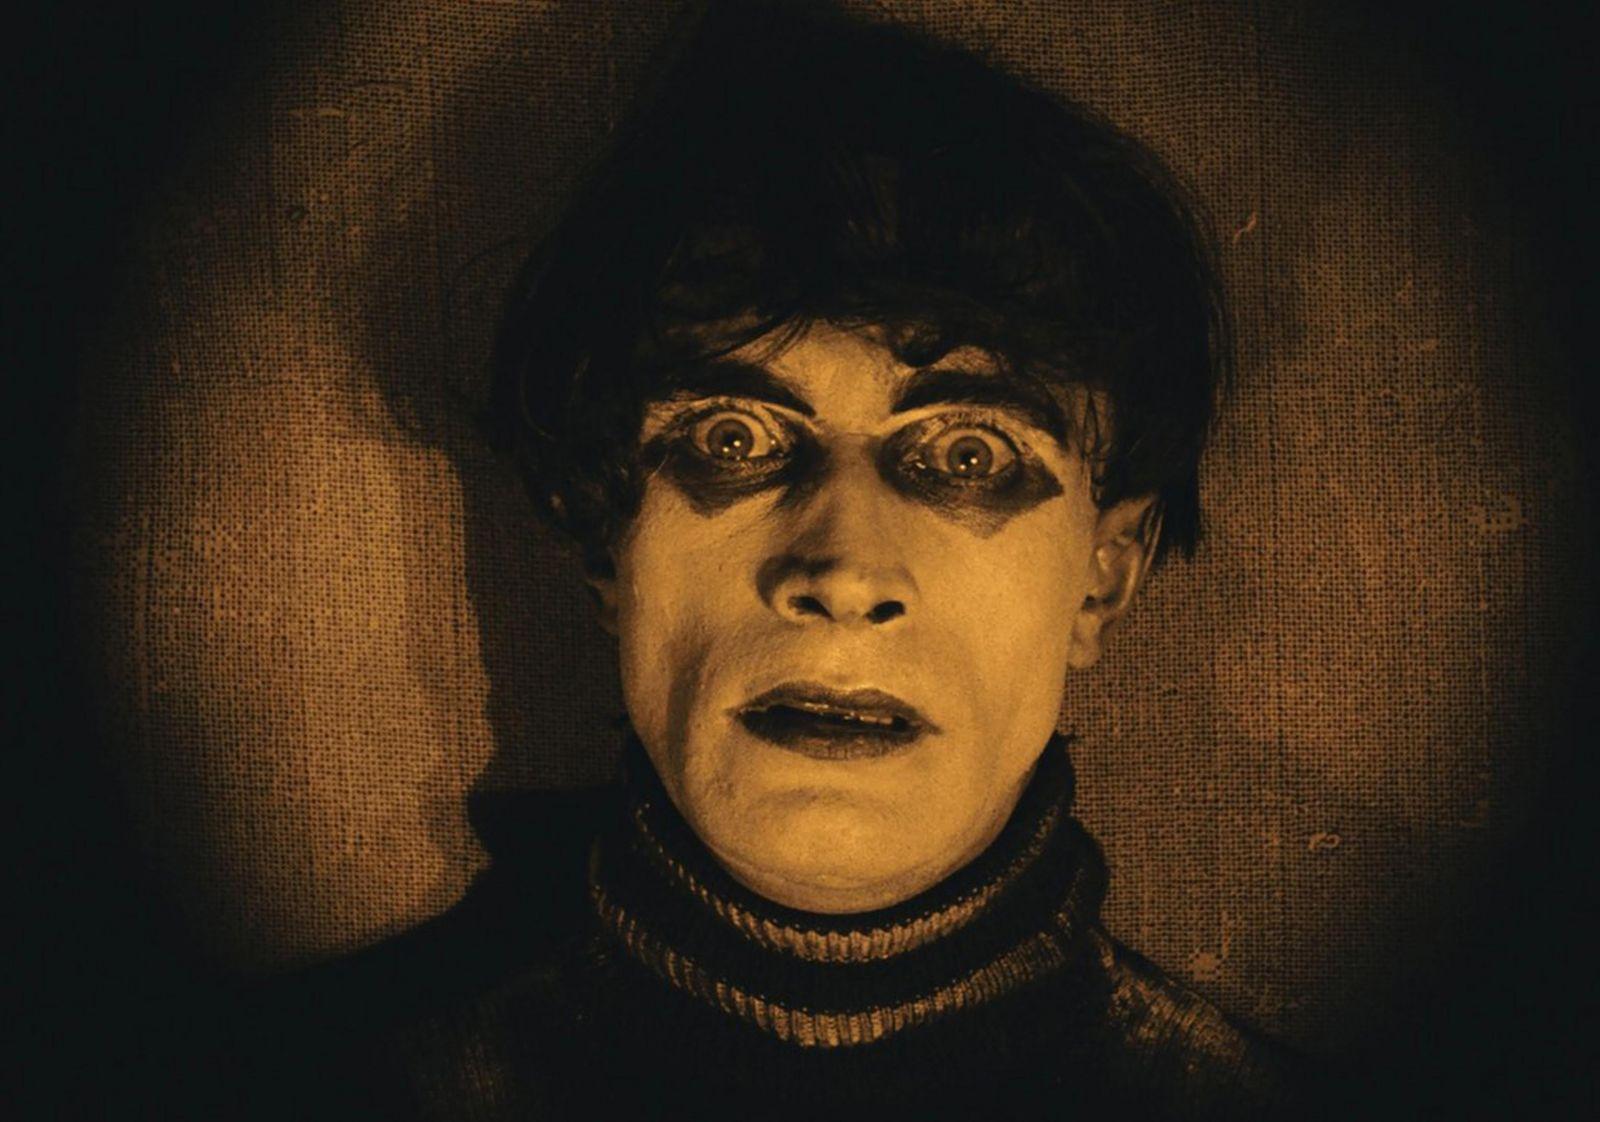 Nahaufnahme von Conrad Veidt als Cesare in Das Cabinet des Dr. Caligari